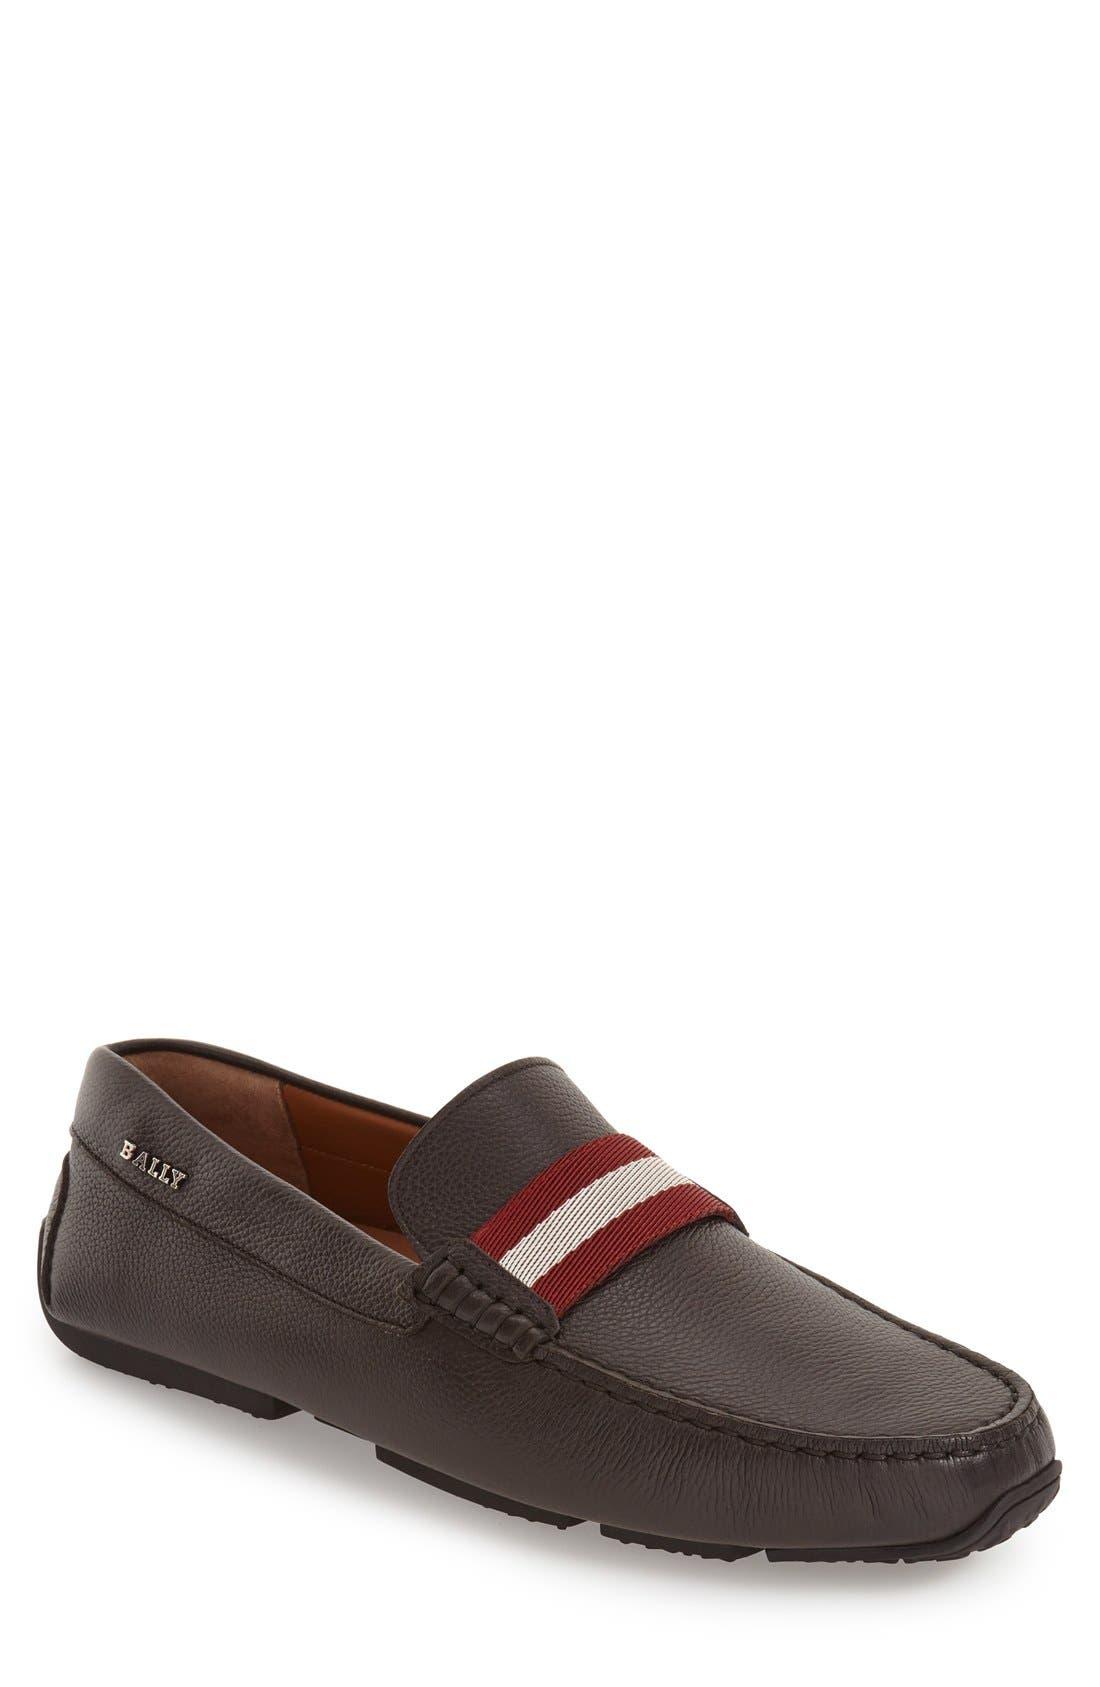 Bally 'Pearce' Driving Shoe (Men)